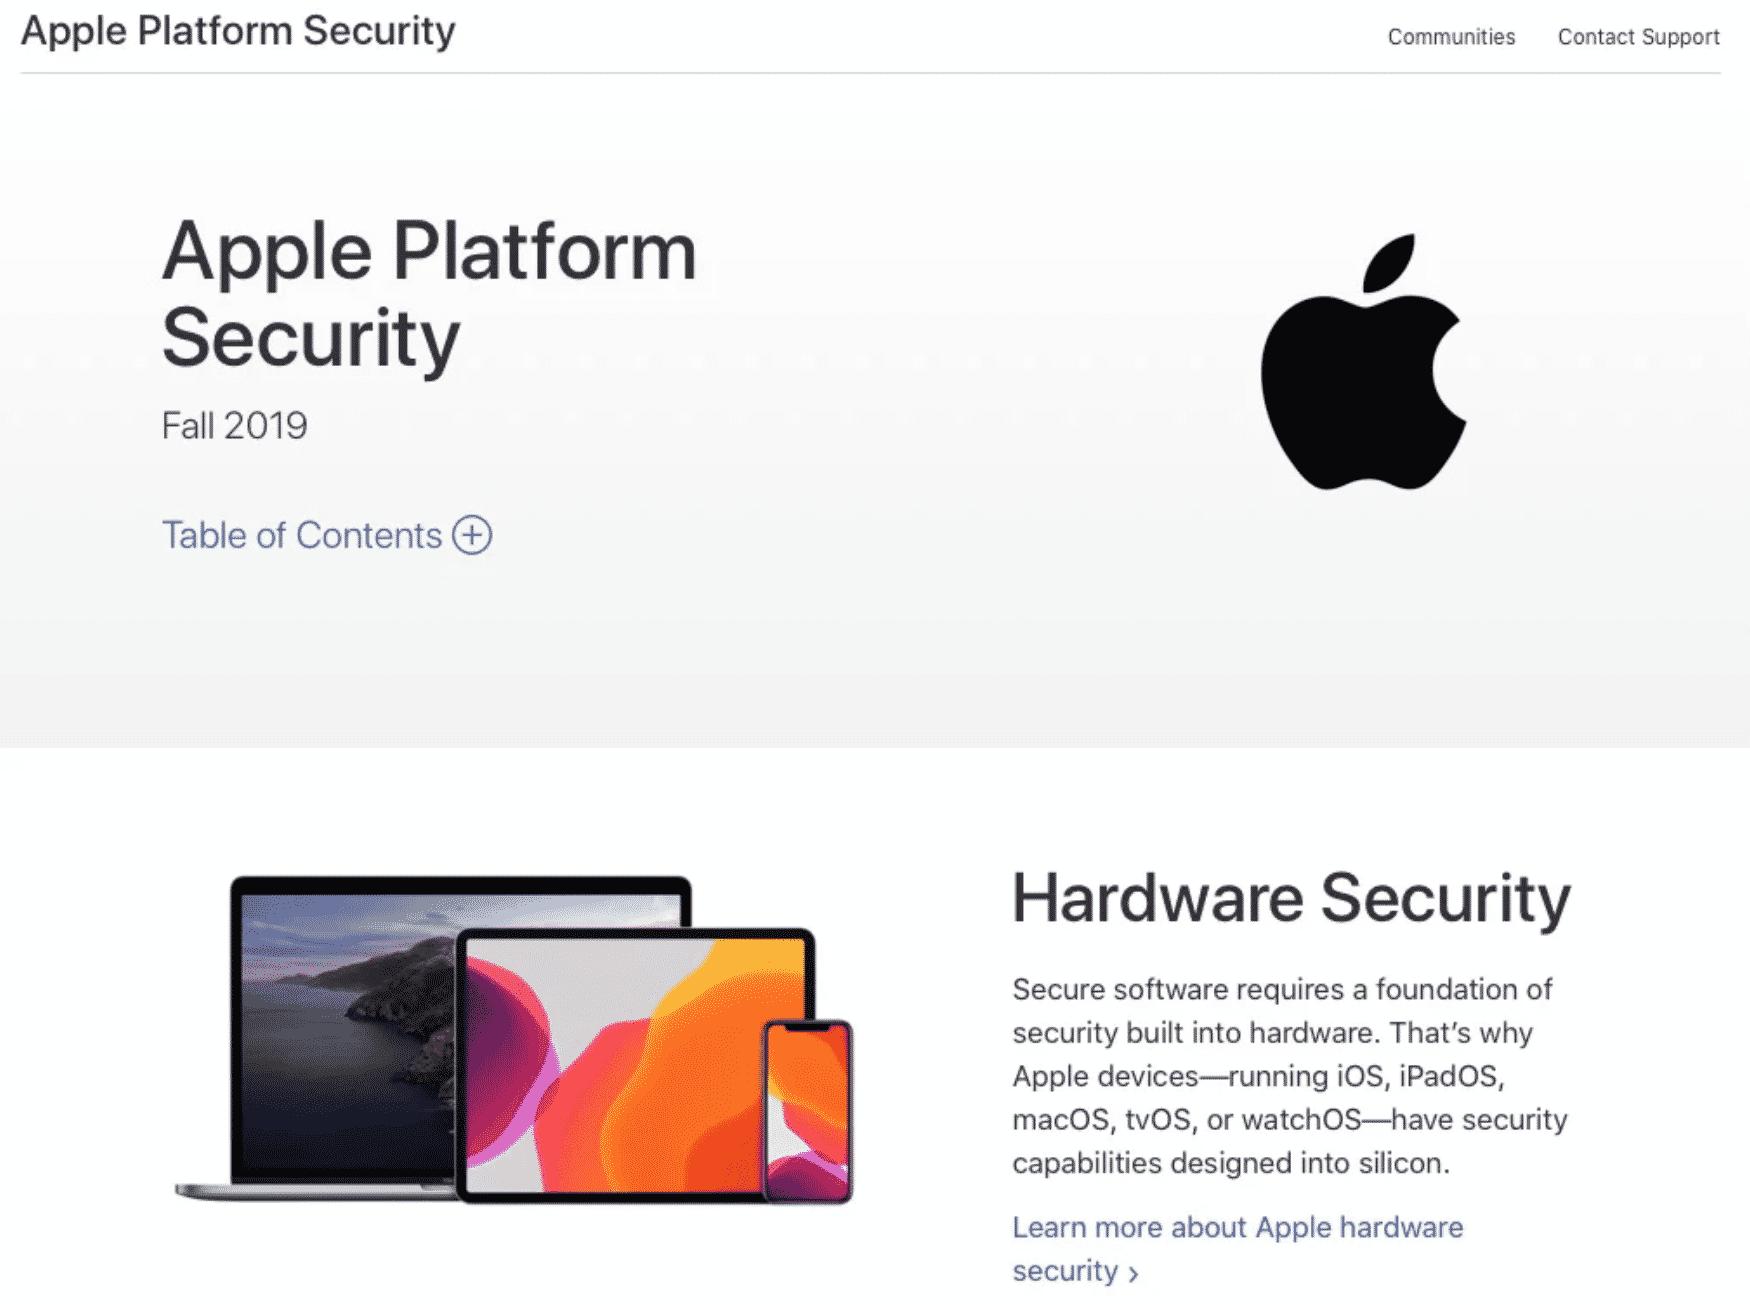 New Apple Platform Security Manual Revealed